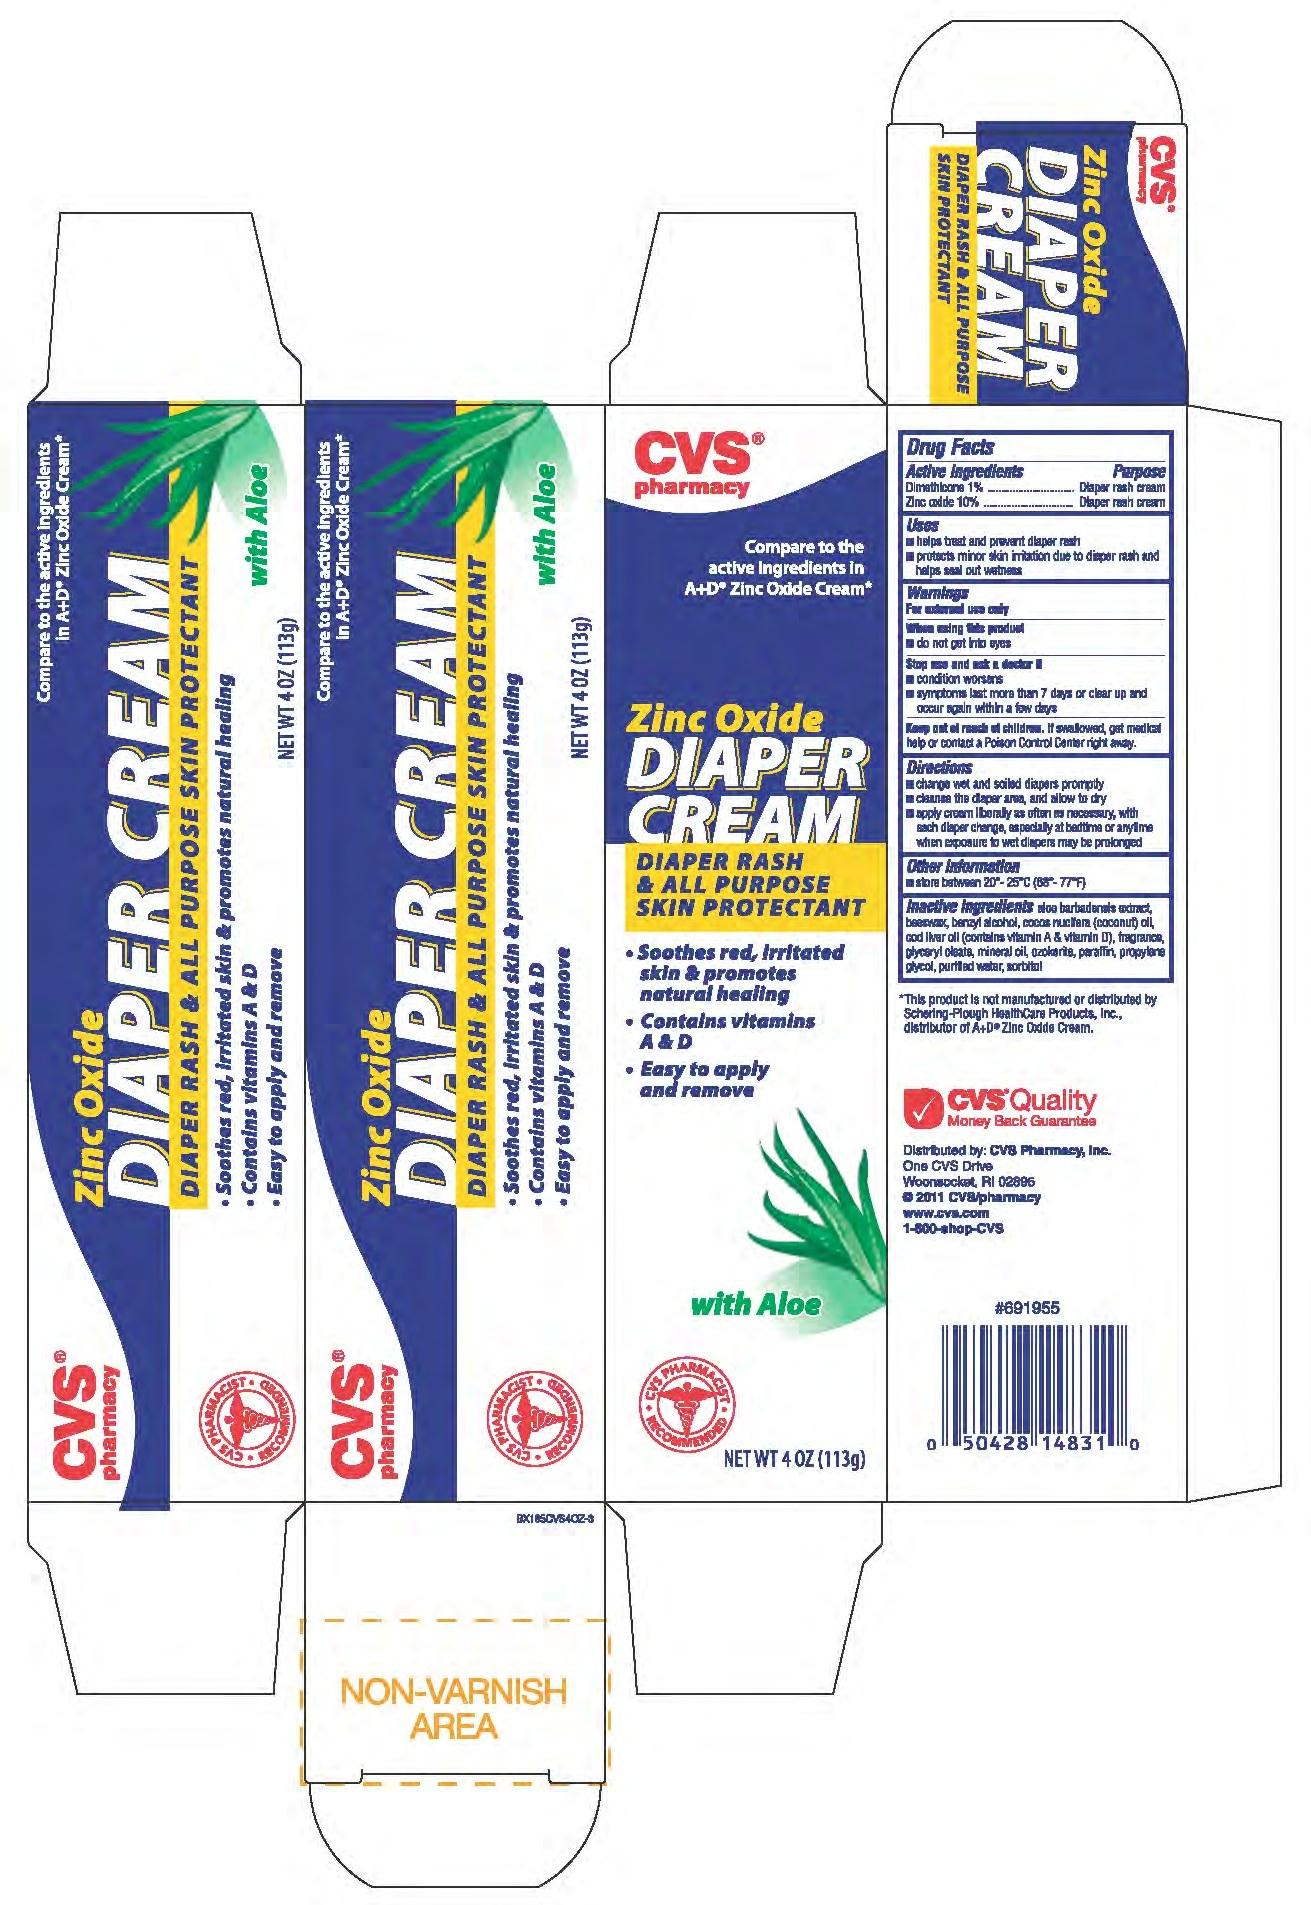 Dimethicone And Zinc Oxide Ointment [Cvs]